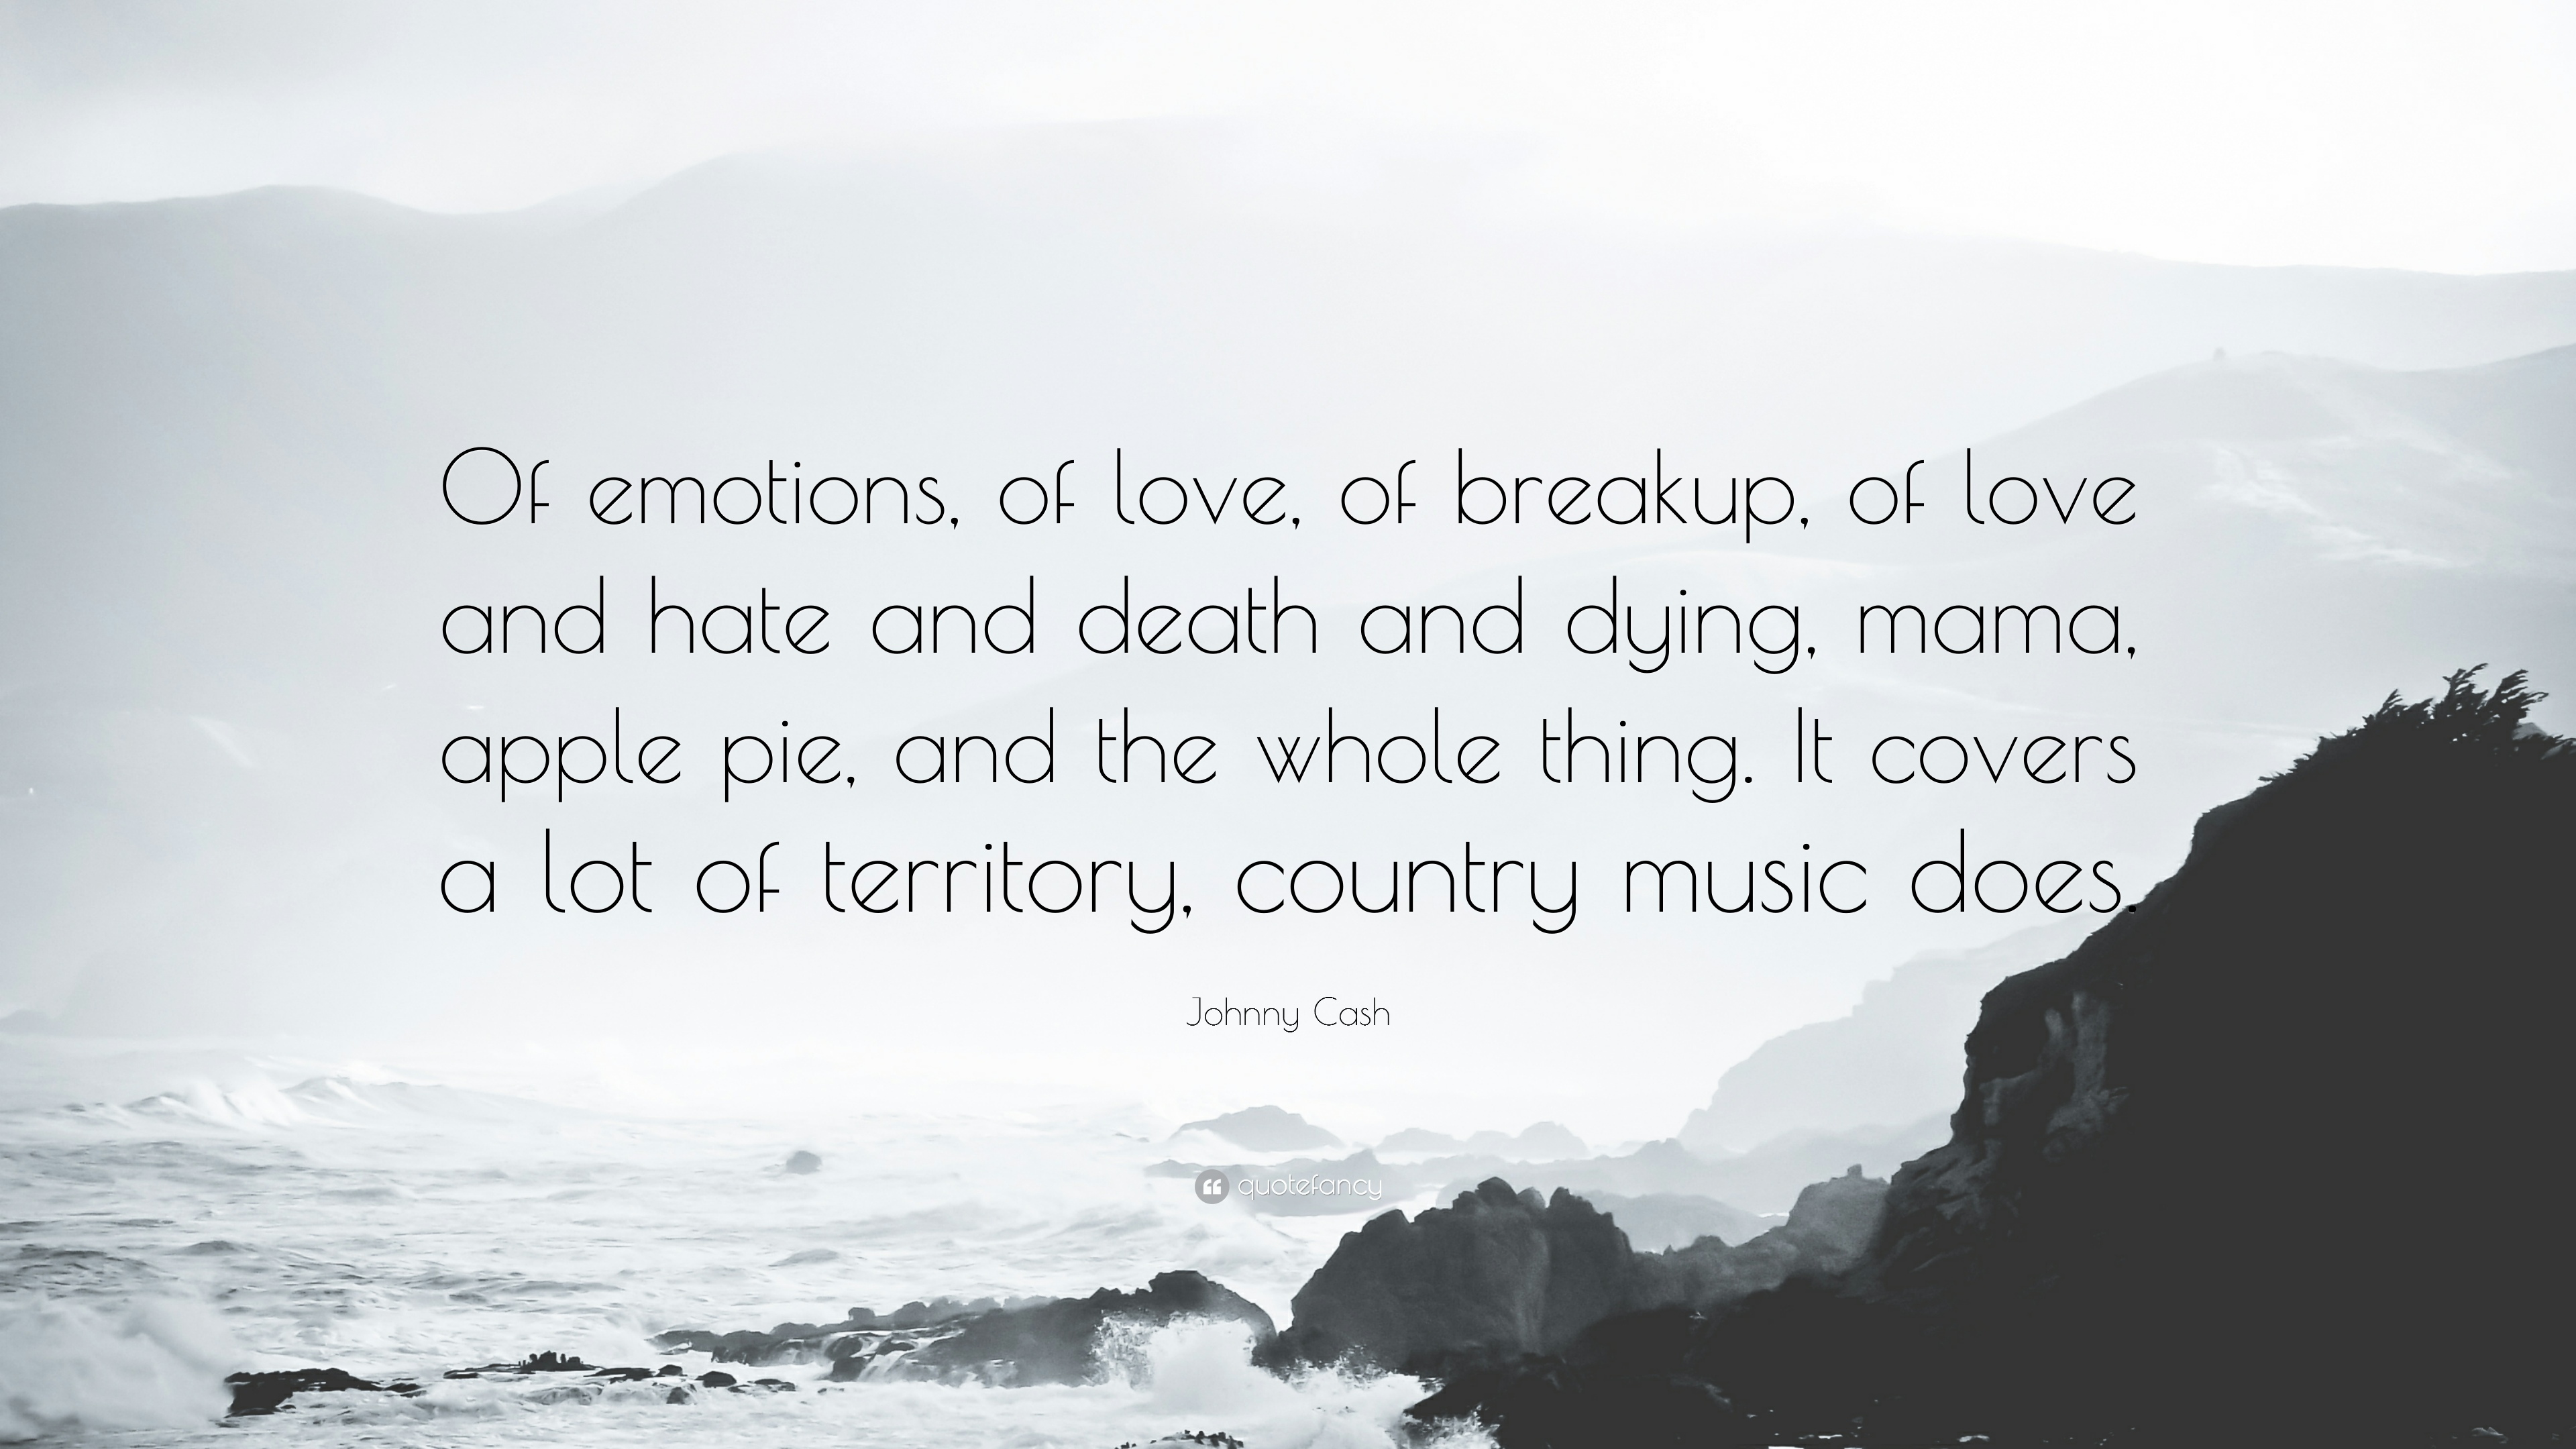 Popular Wallpaper Love Breakup - 42557-Johnny-Cash-Quote-Of-emotions-of-love-of-breakup-of-love-and-hate  Snapshot_624213.jpg